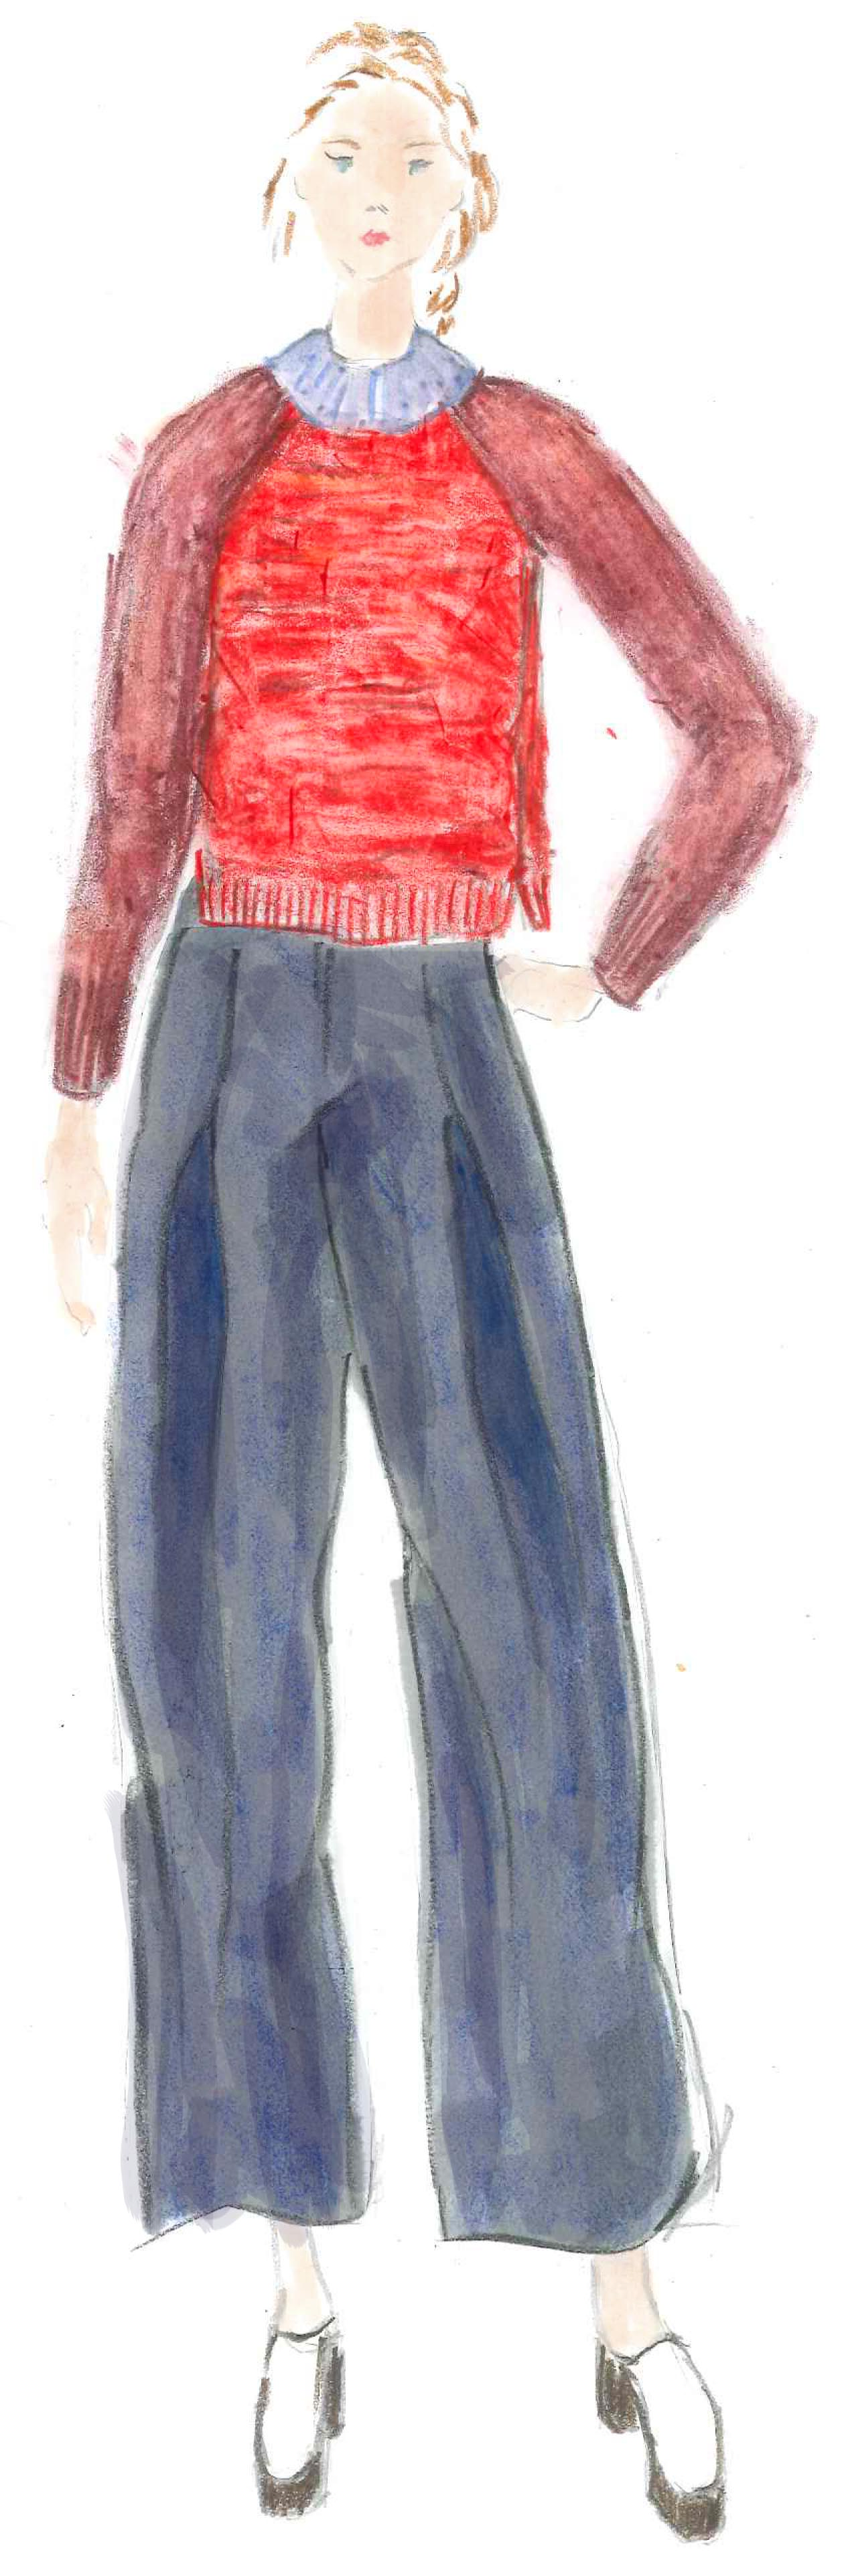 red_blue_sweater_sketch.jpg